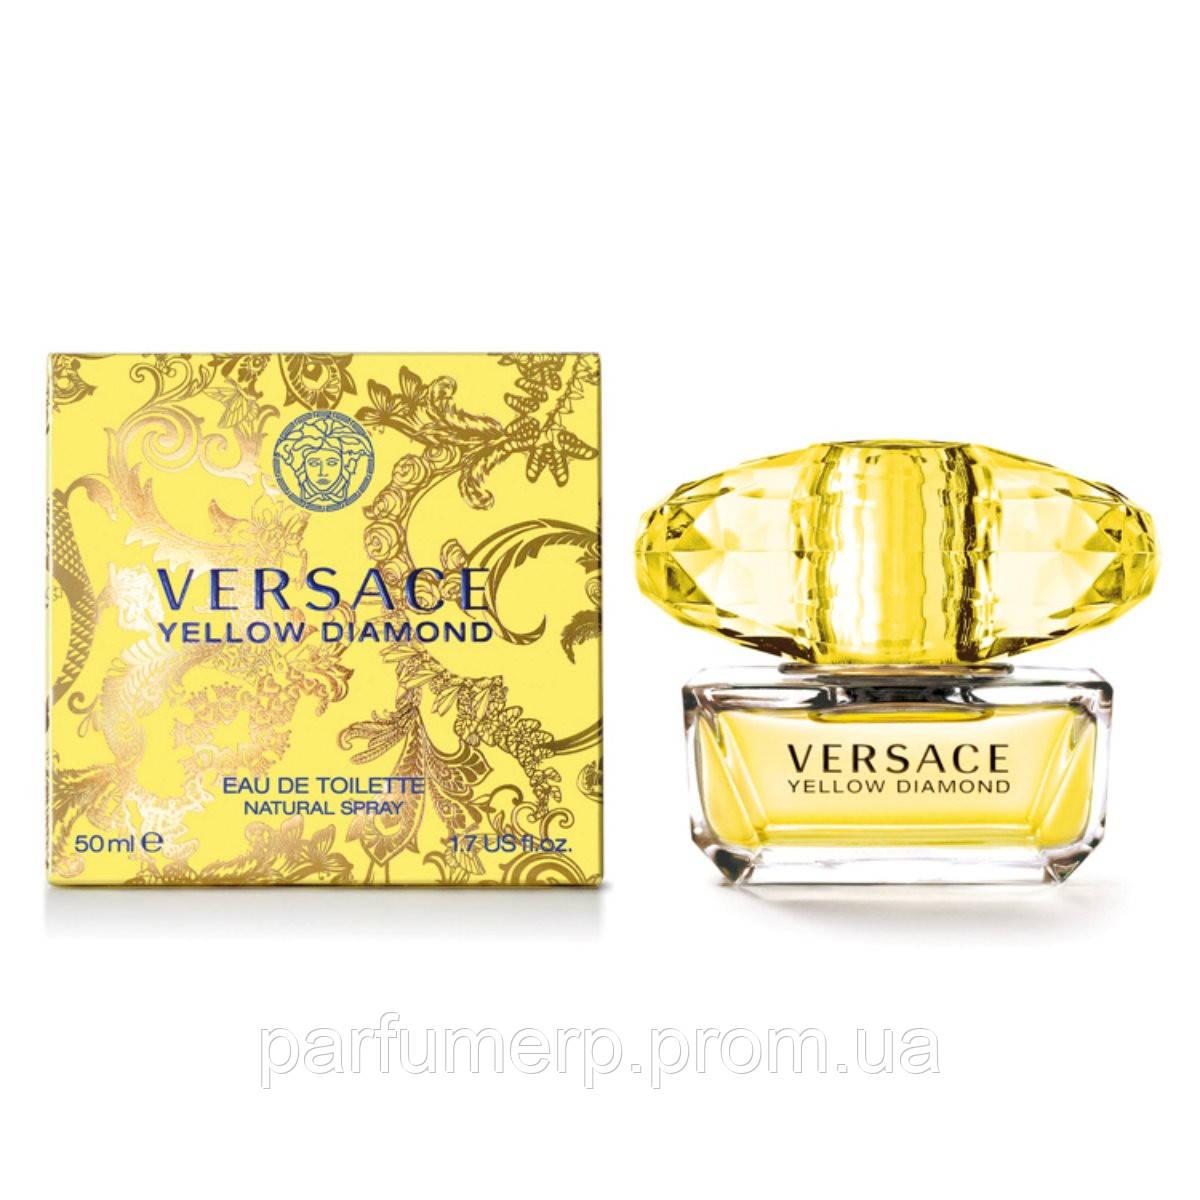 Versace Yellow Diamond (50мл), Женская Туалетная вода  - Оригинал!